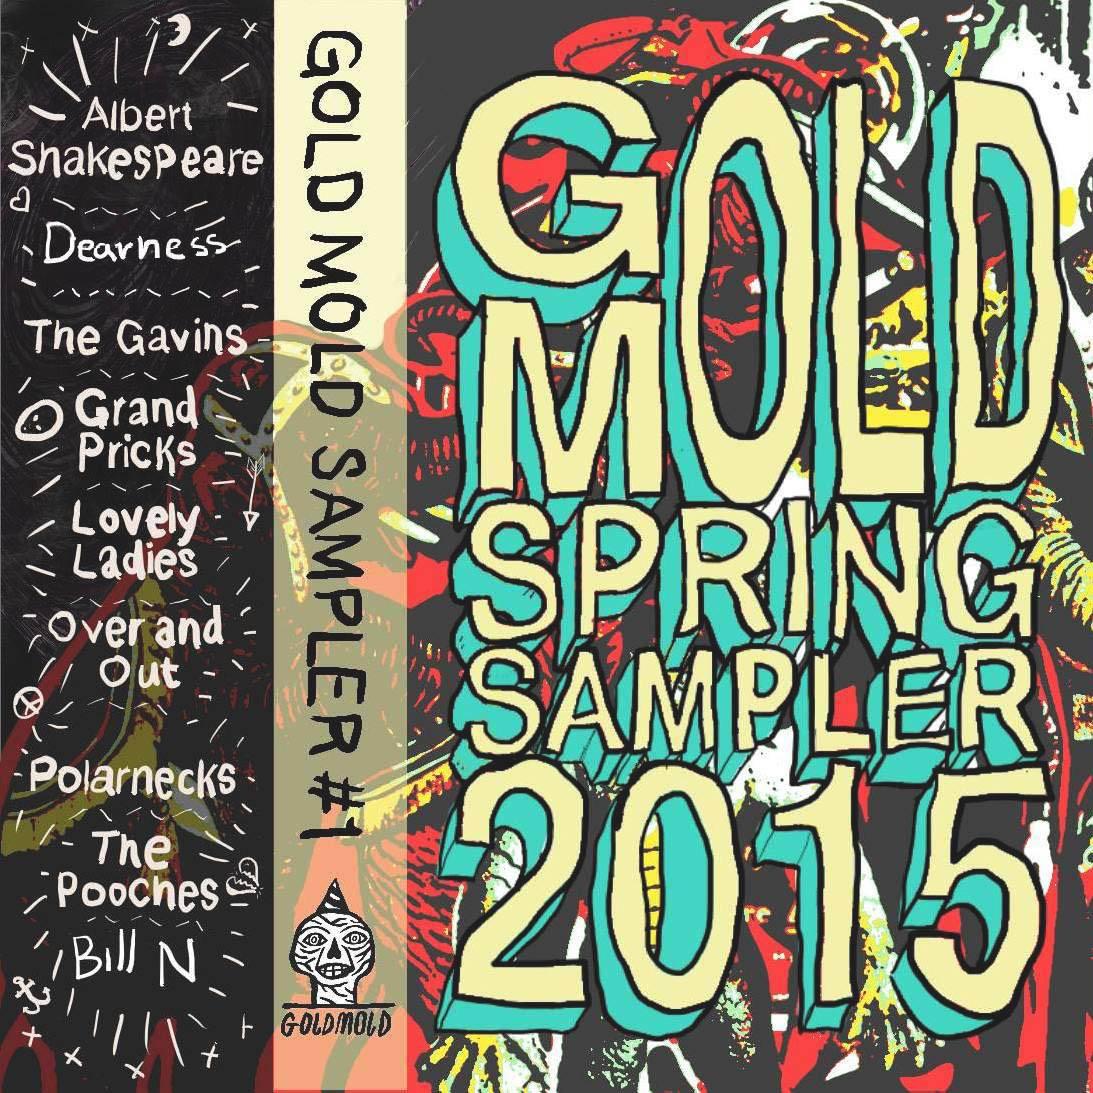 Spring Sampler 2015